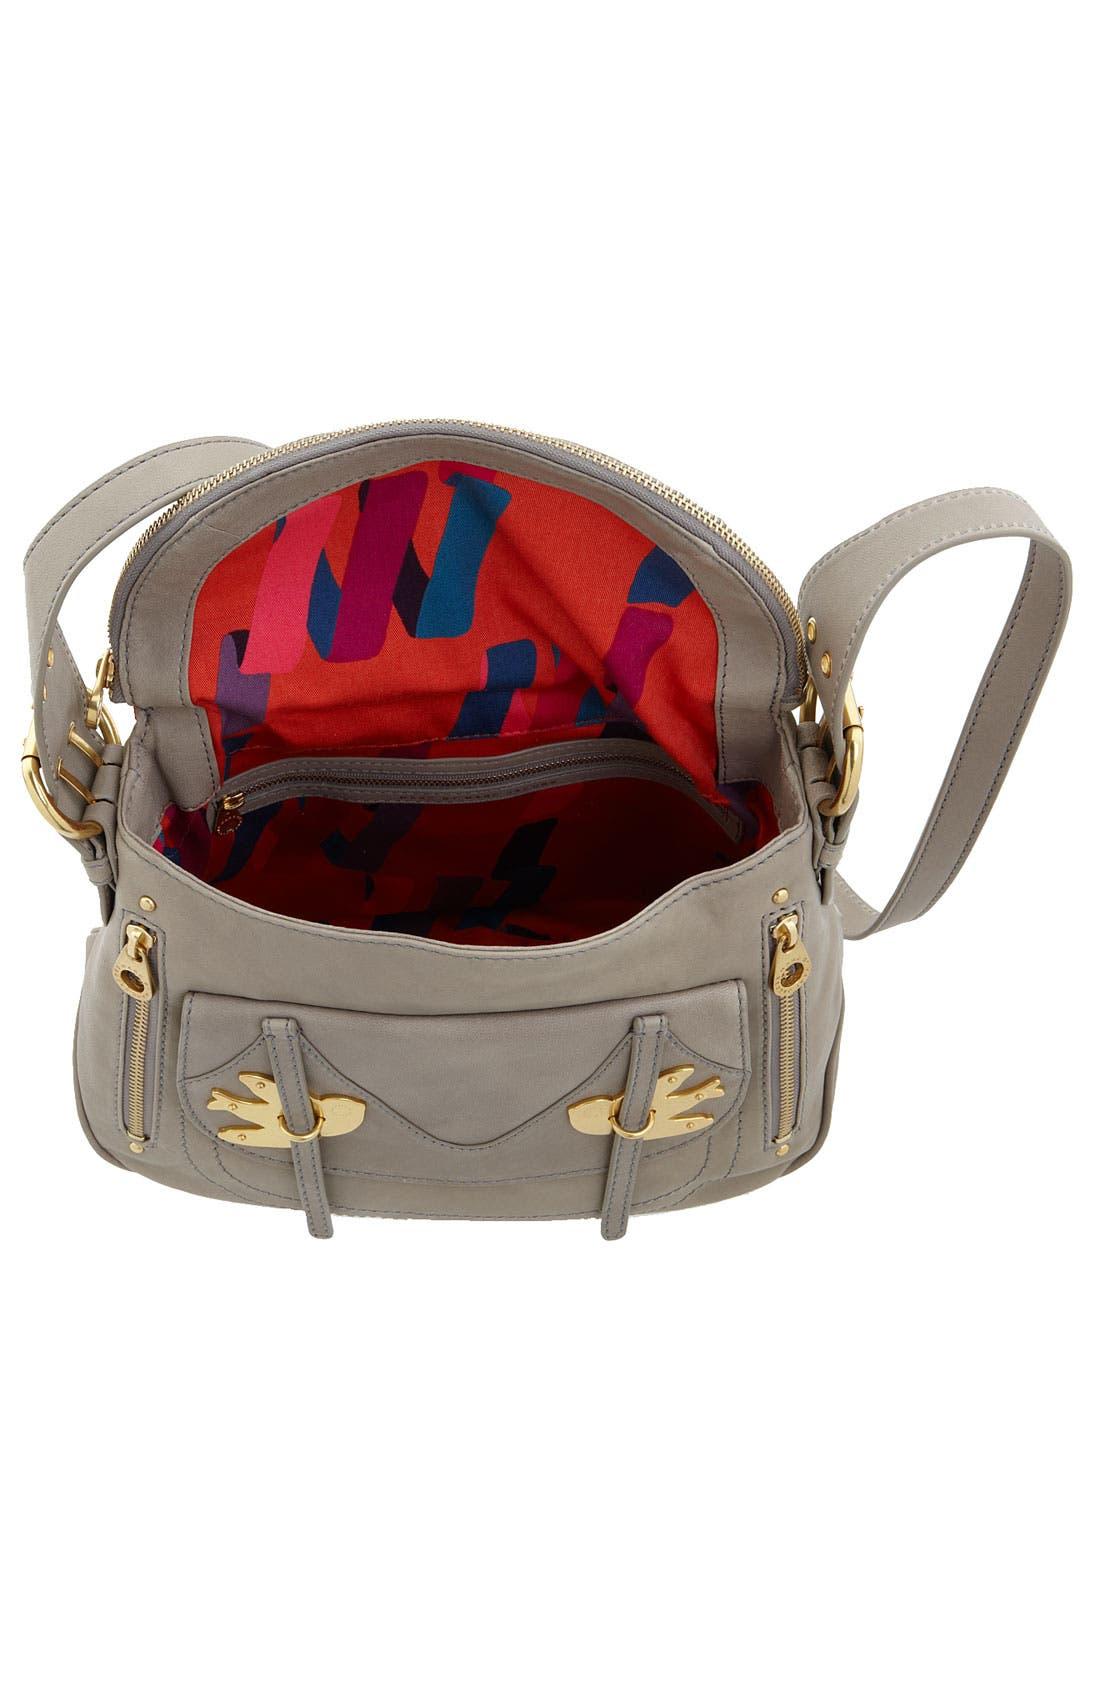 ,                             MARC BY MARC JACOBS 'Petal to the Metal - Natasha' Flap Crossbody Bag, Medium,                             Alternate thumbnail 14, color,                             050